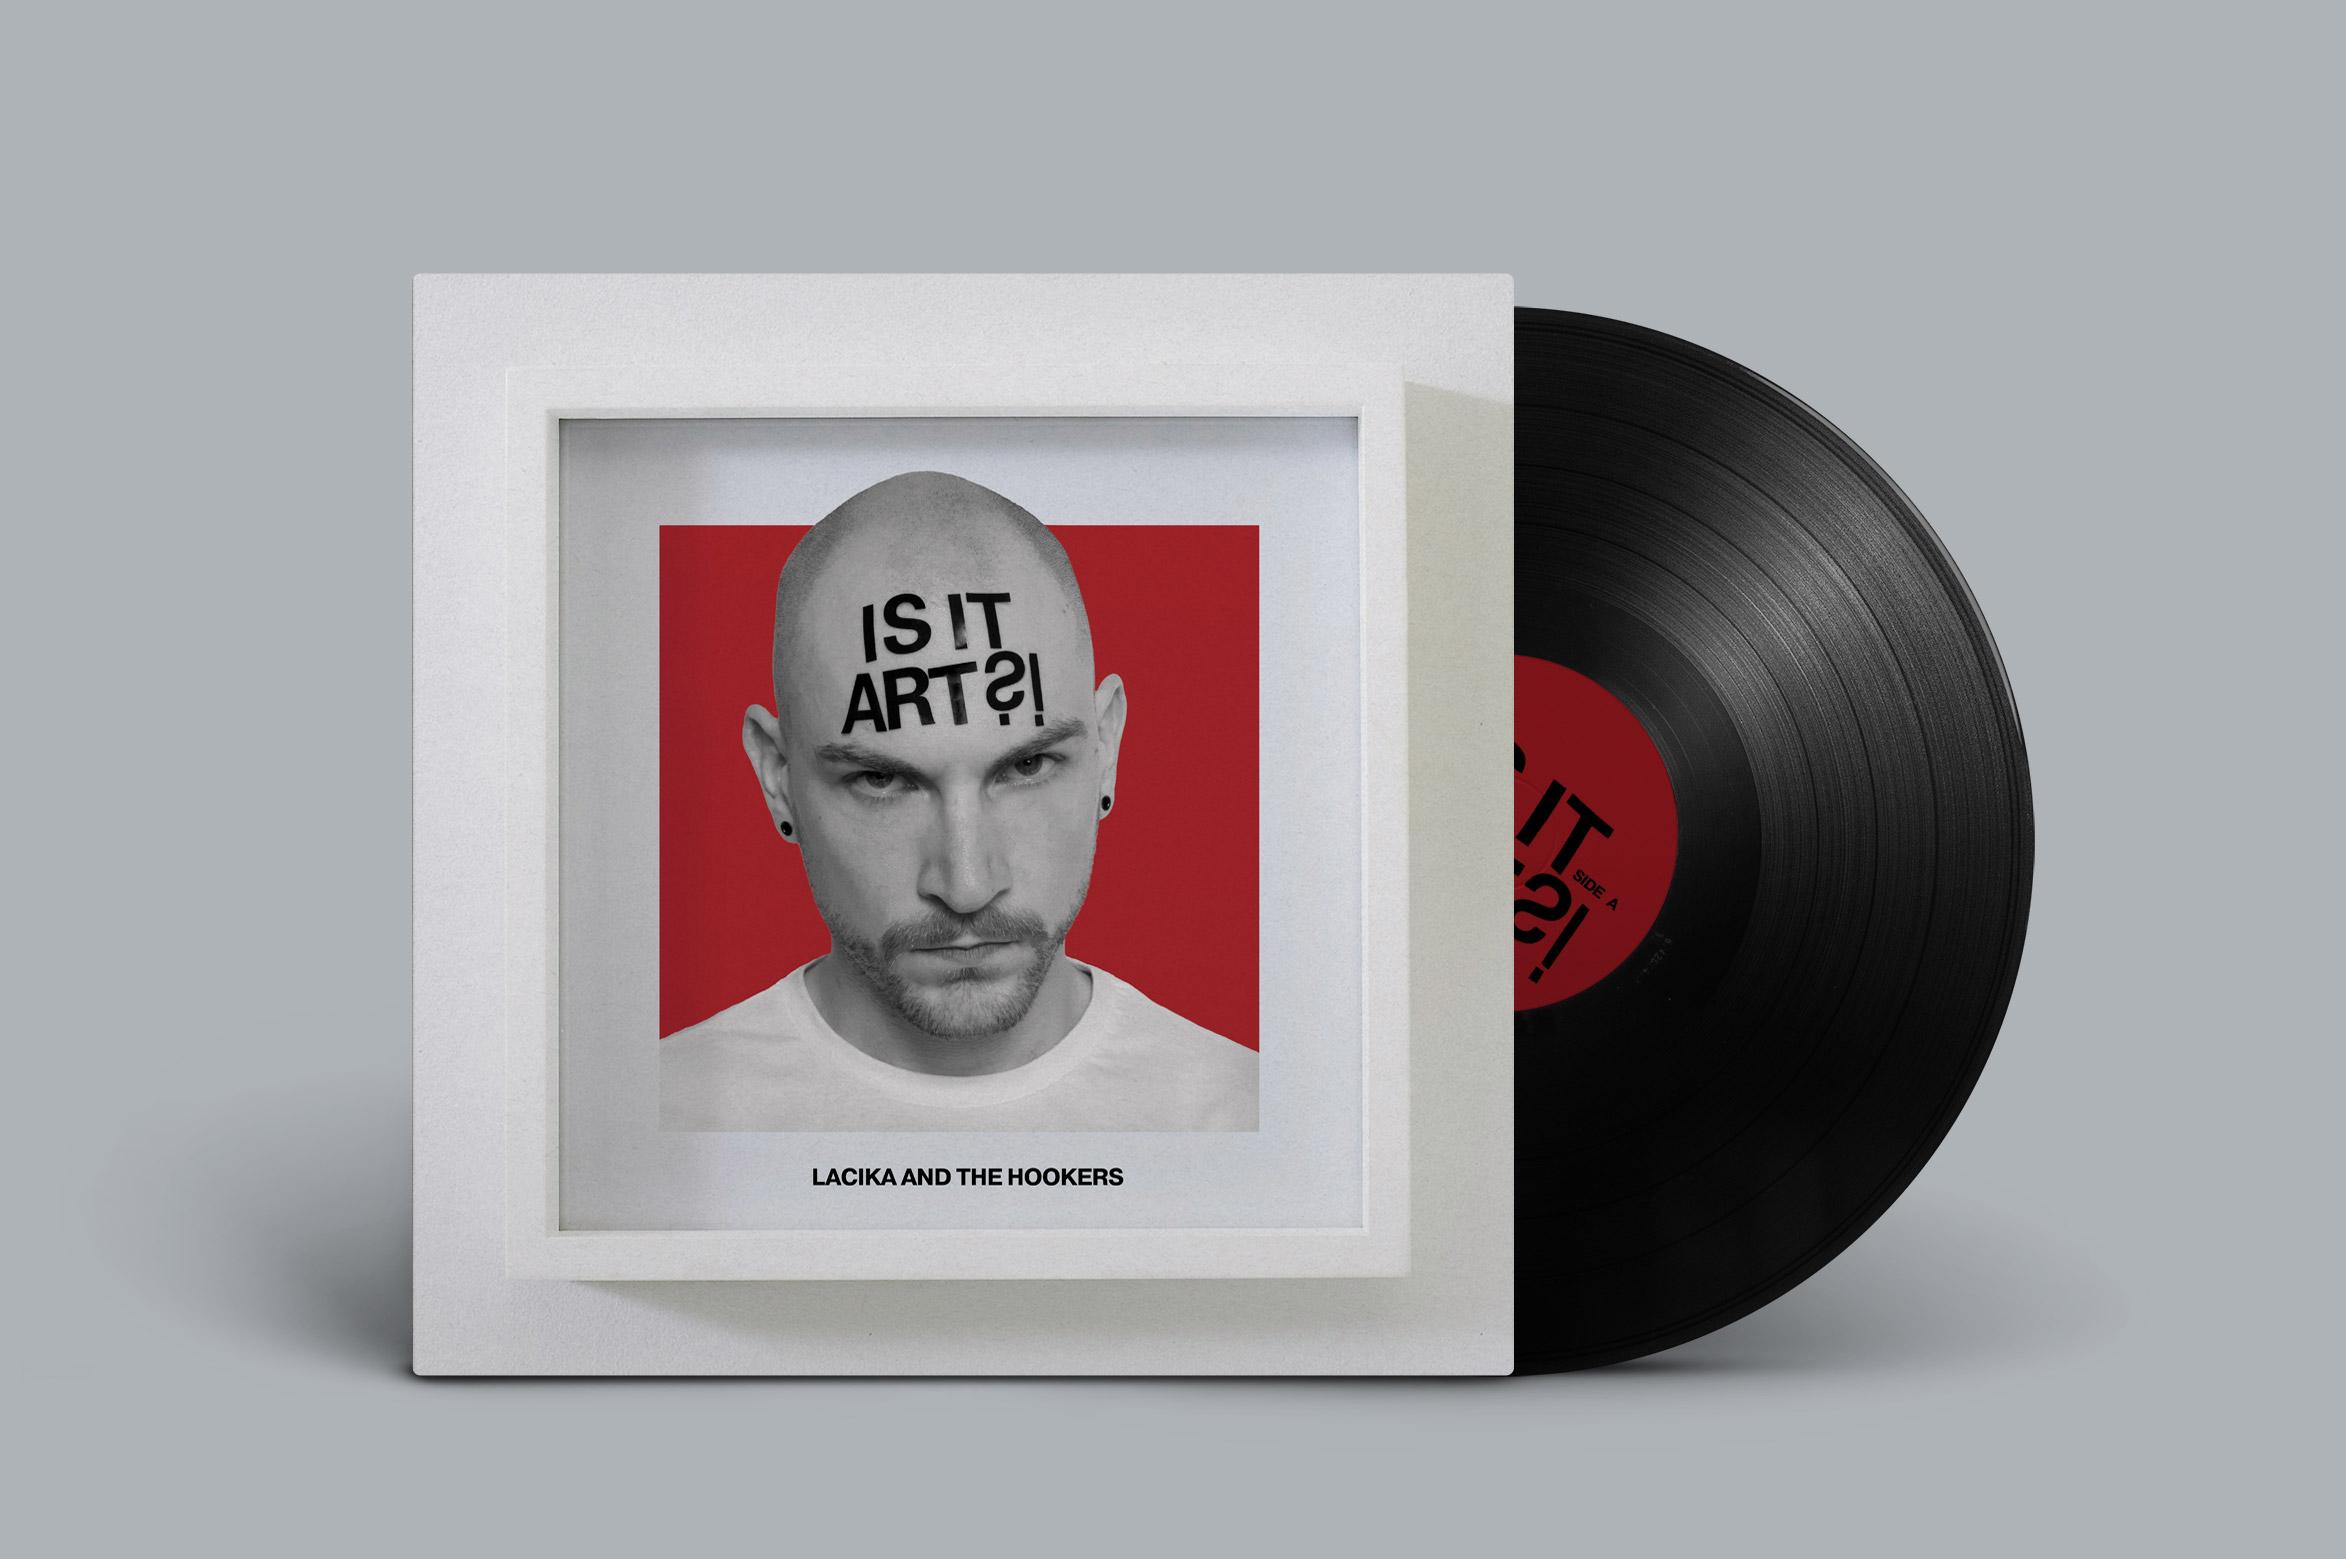 LATH Lacika And The Hookers Mario Dzurila Album Cover Design Music EP